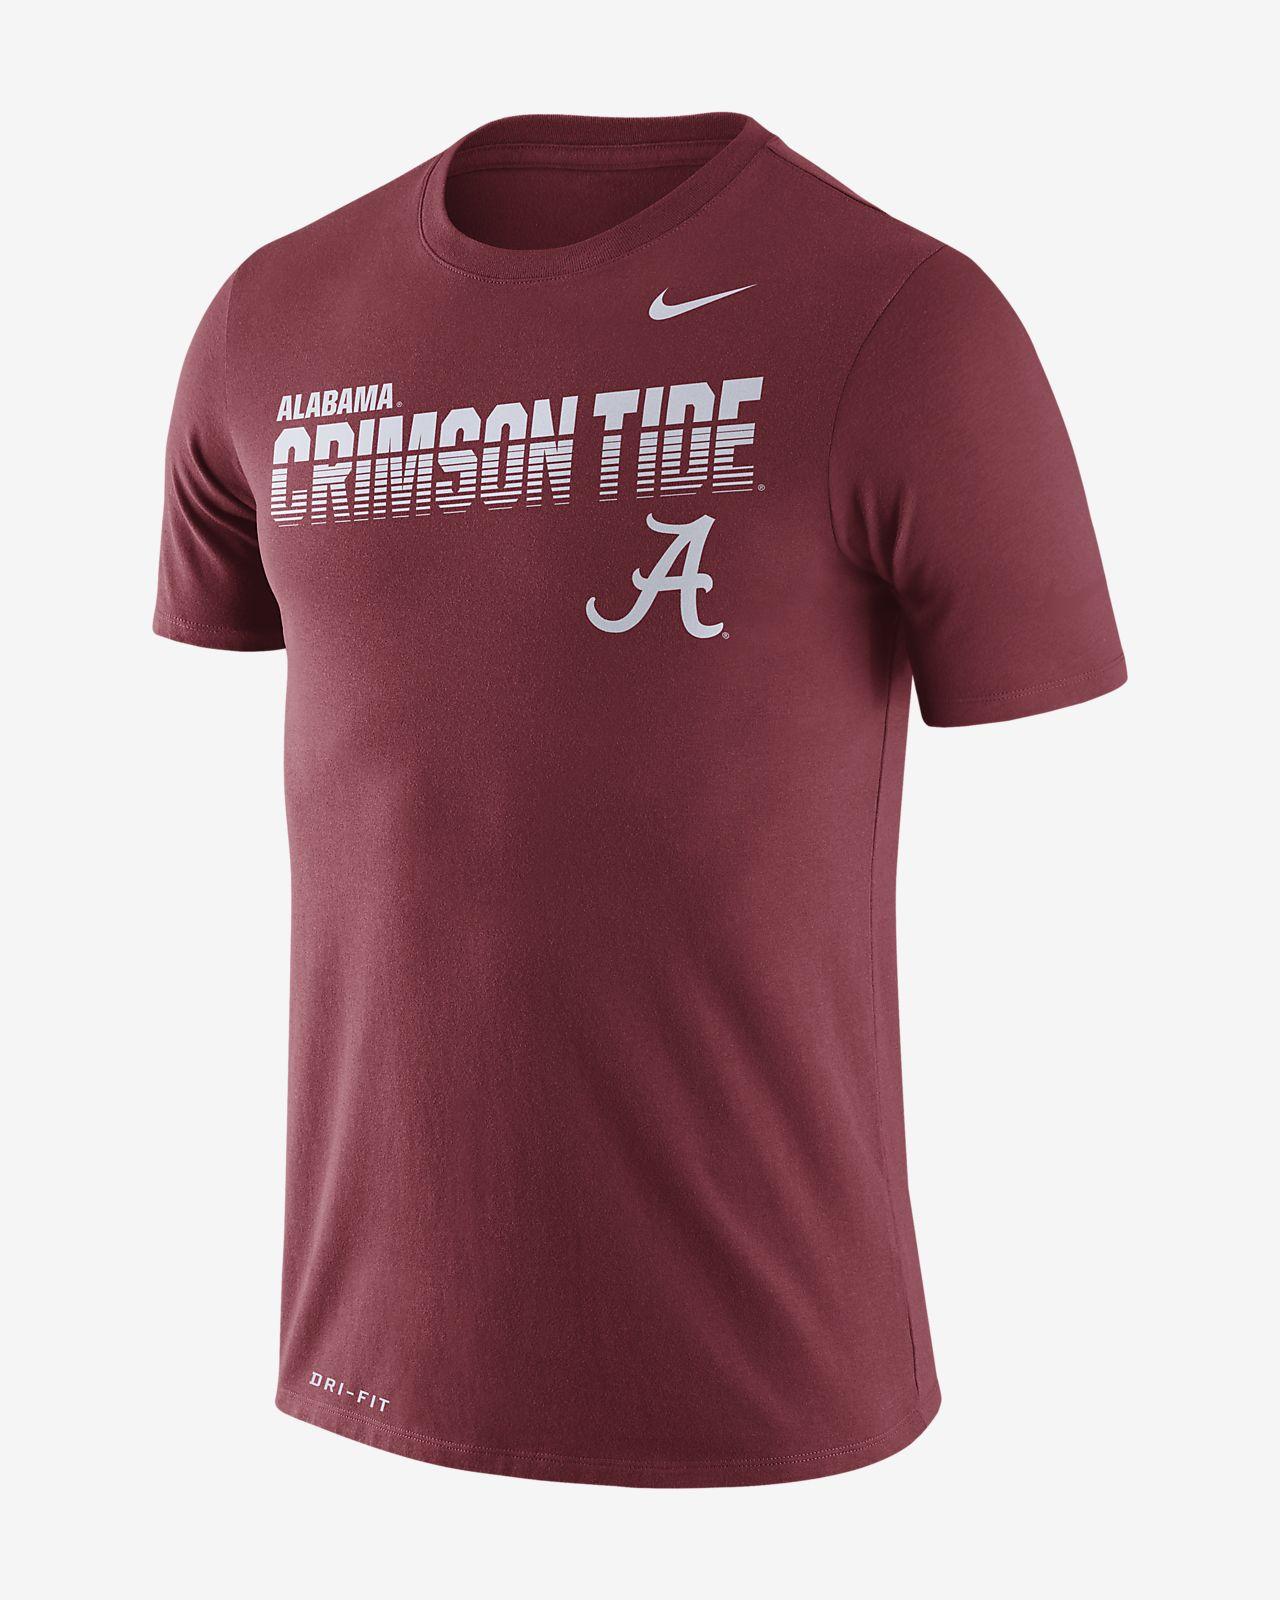 Nike College Dri-FIT Legend (Alabama) Men's T-Shirt